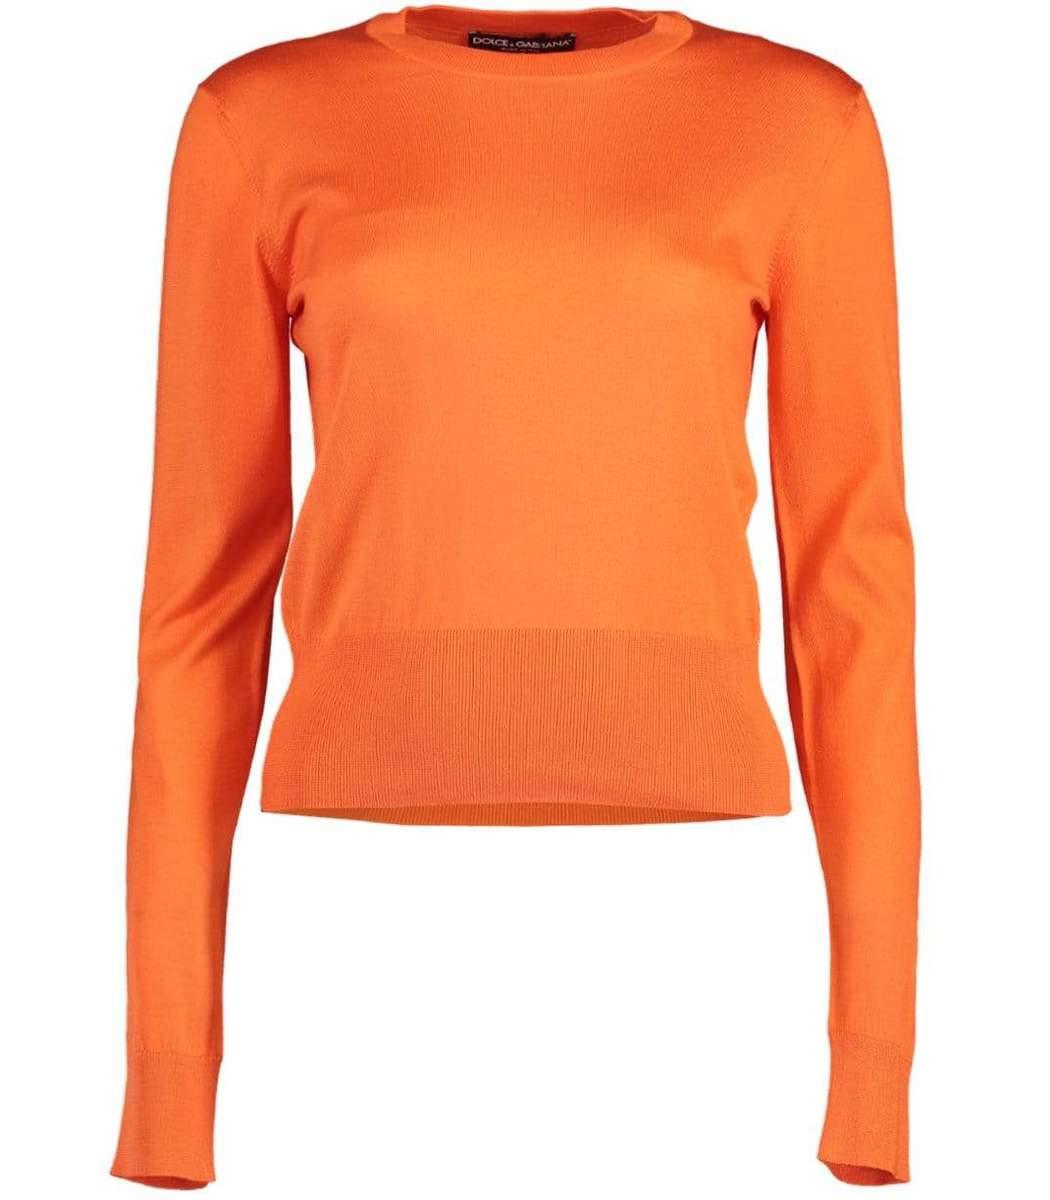 Dolce & Gabbana Mandarine Silk Crewneck Pullover Top